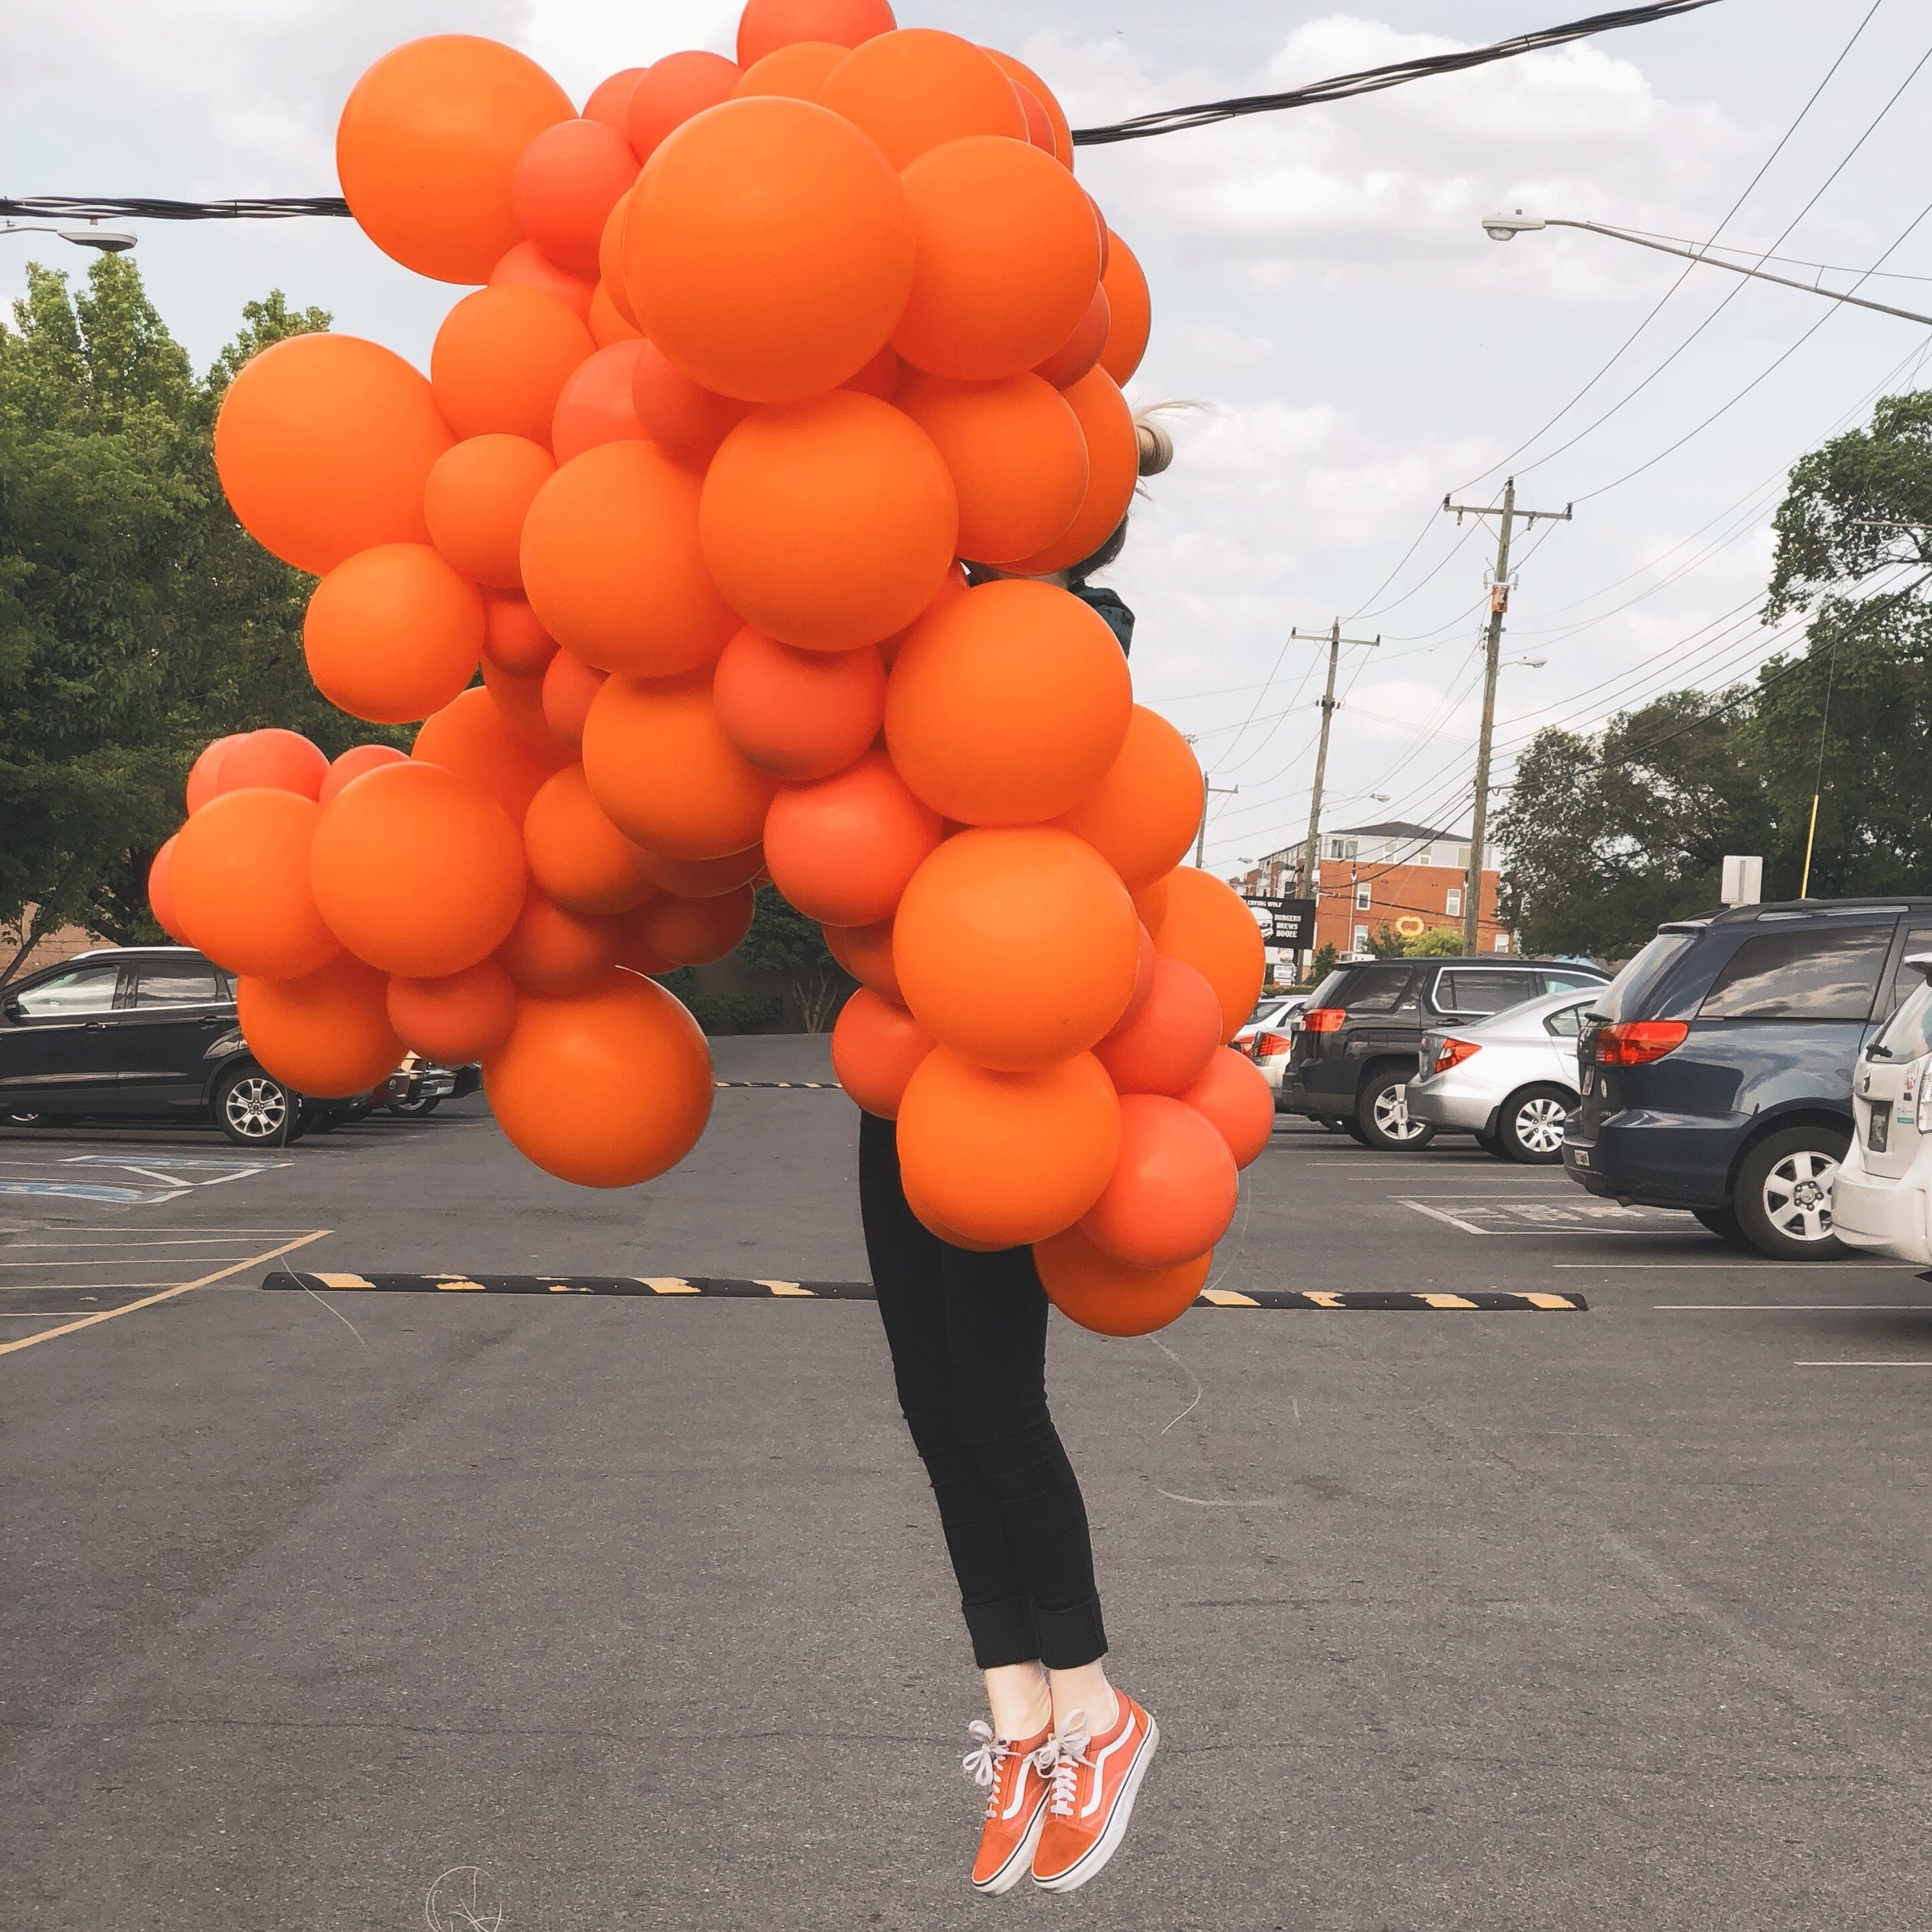 vroom_vroom_balloon_indoor_organic_garland_pink_orange.JPG